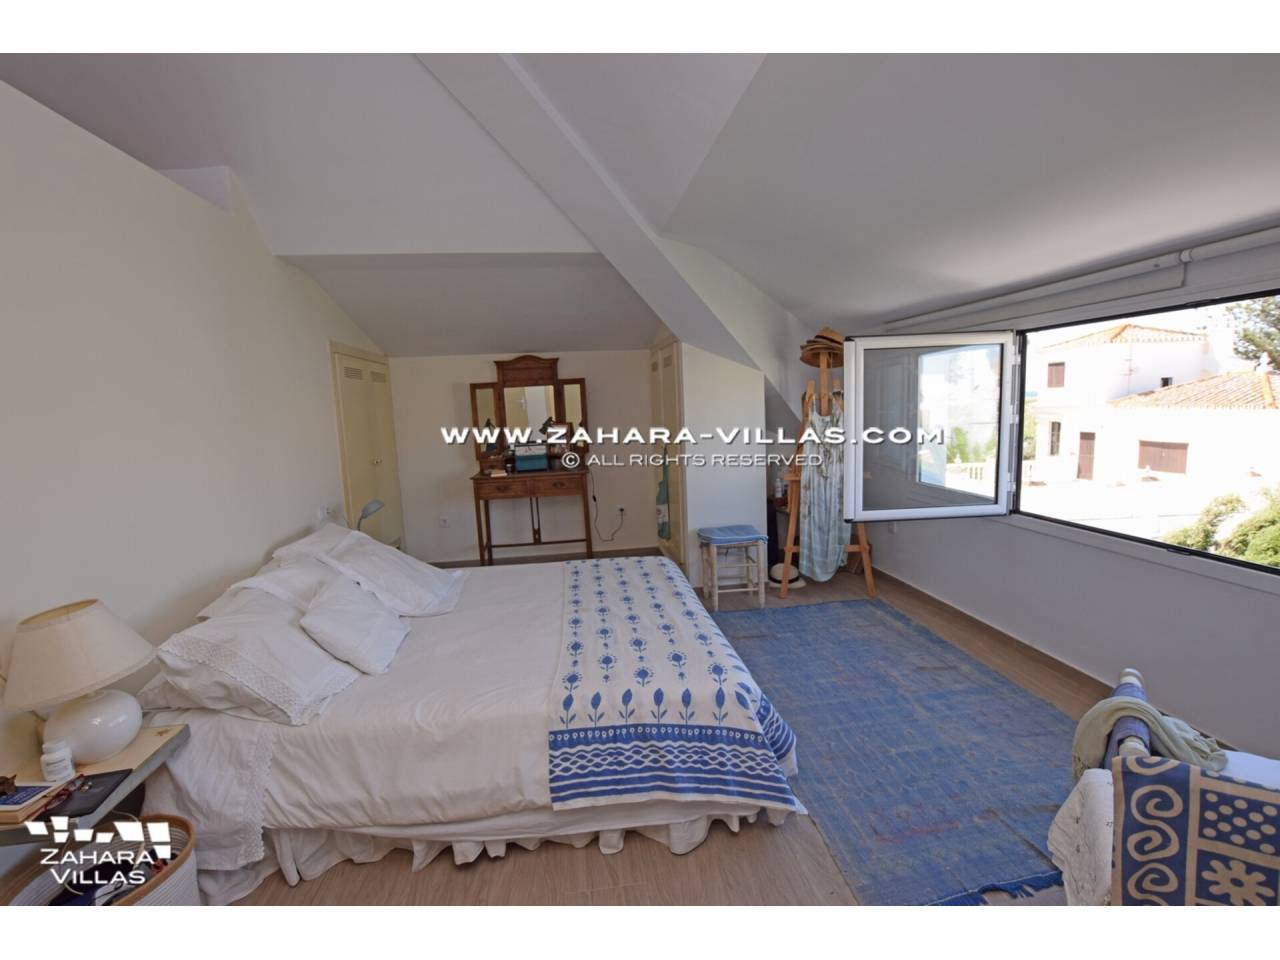 Imagen 35 de House for sale close to the beach, with sea views in Zahara de los Atunes